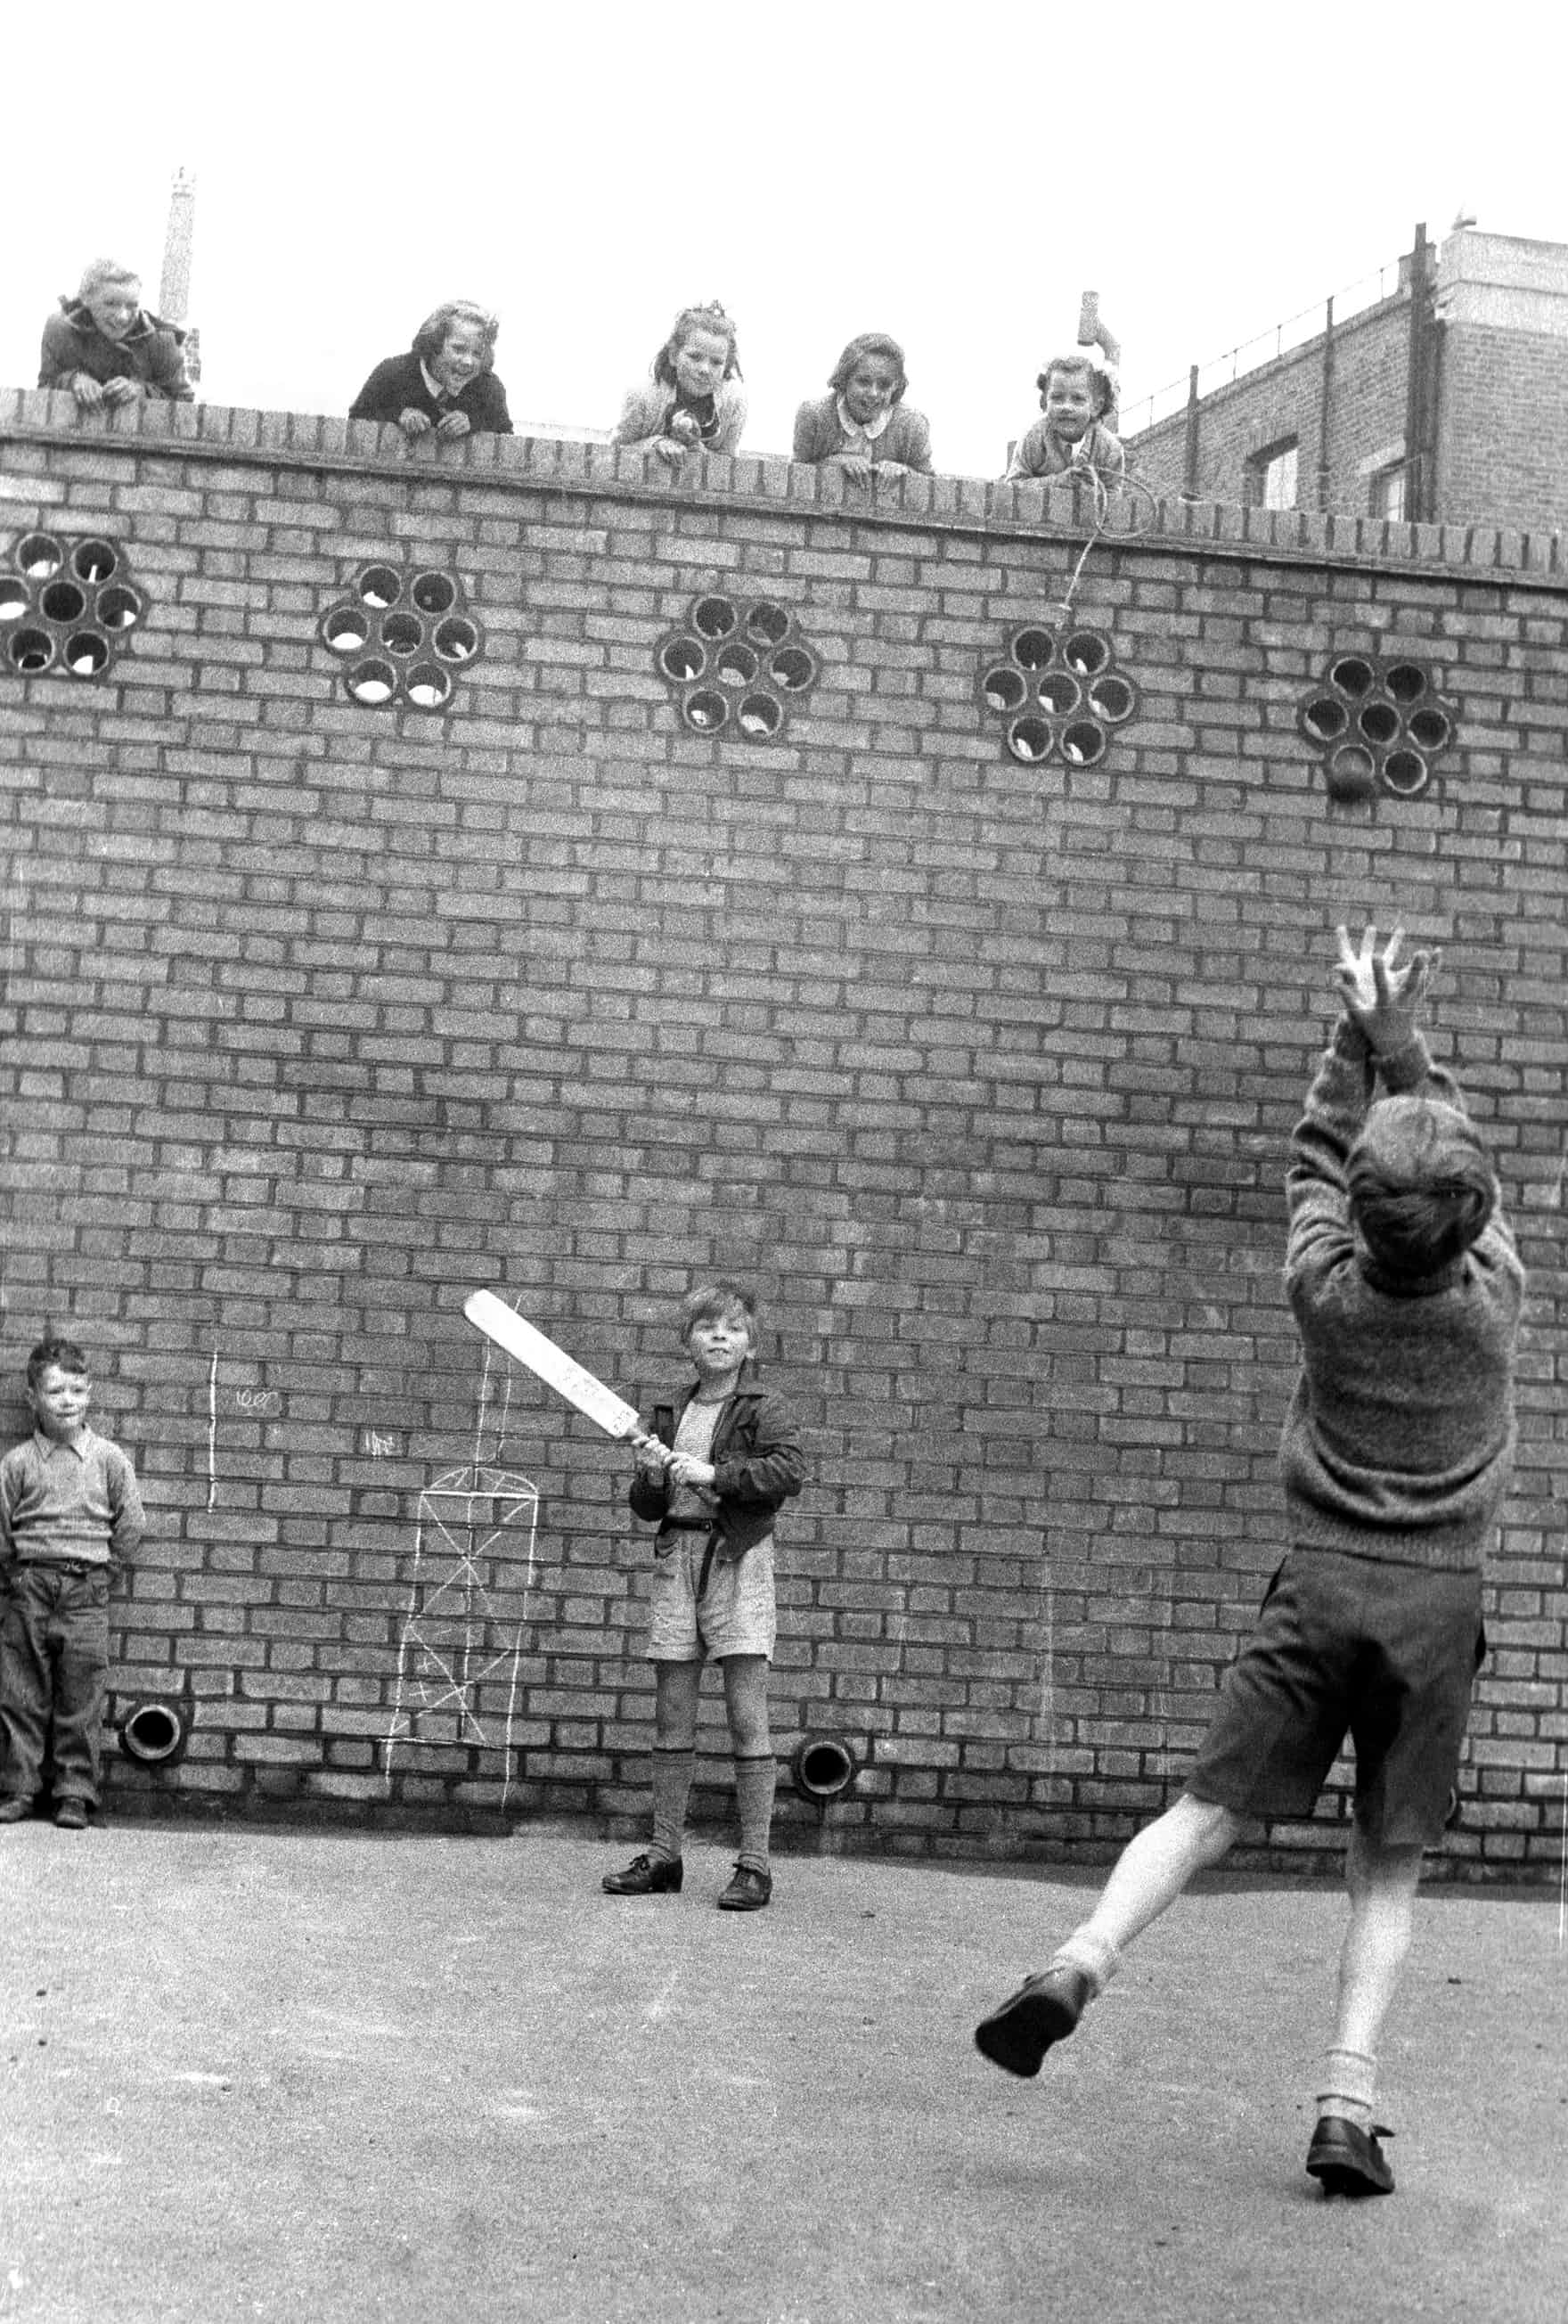 Fotó: Ken Russell: Bowled Over, 1956 © Ken Russell/TopFoto